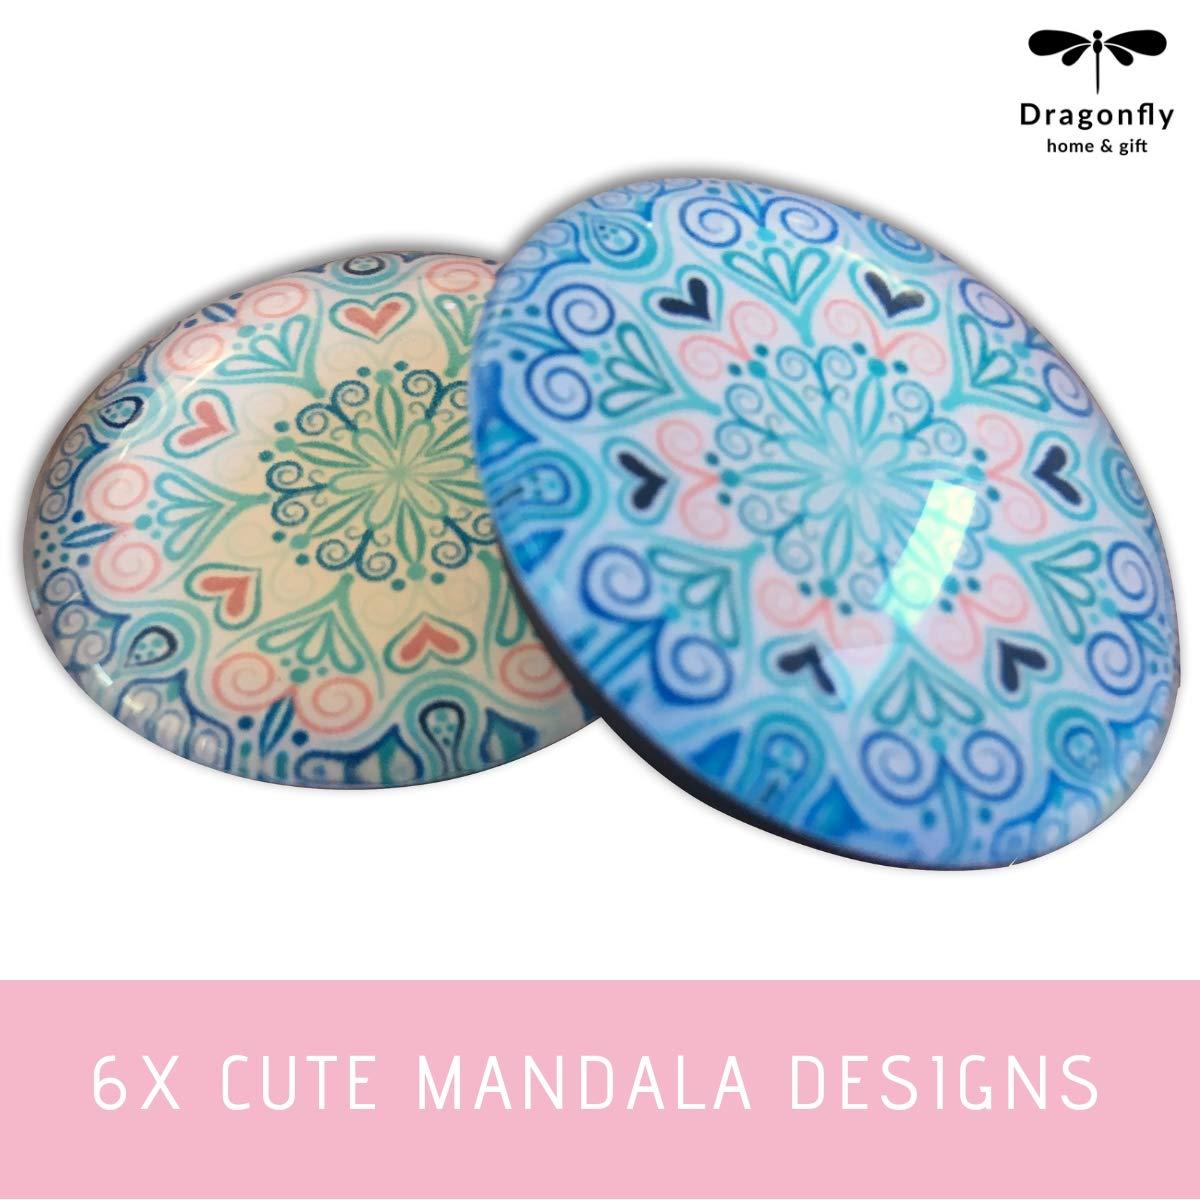 Dragonfly home /& gift Magnets for Stainless Steel Fridge//Refrigerator Glass Magnet Set Mandala Design 6 Pc